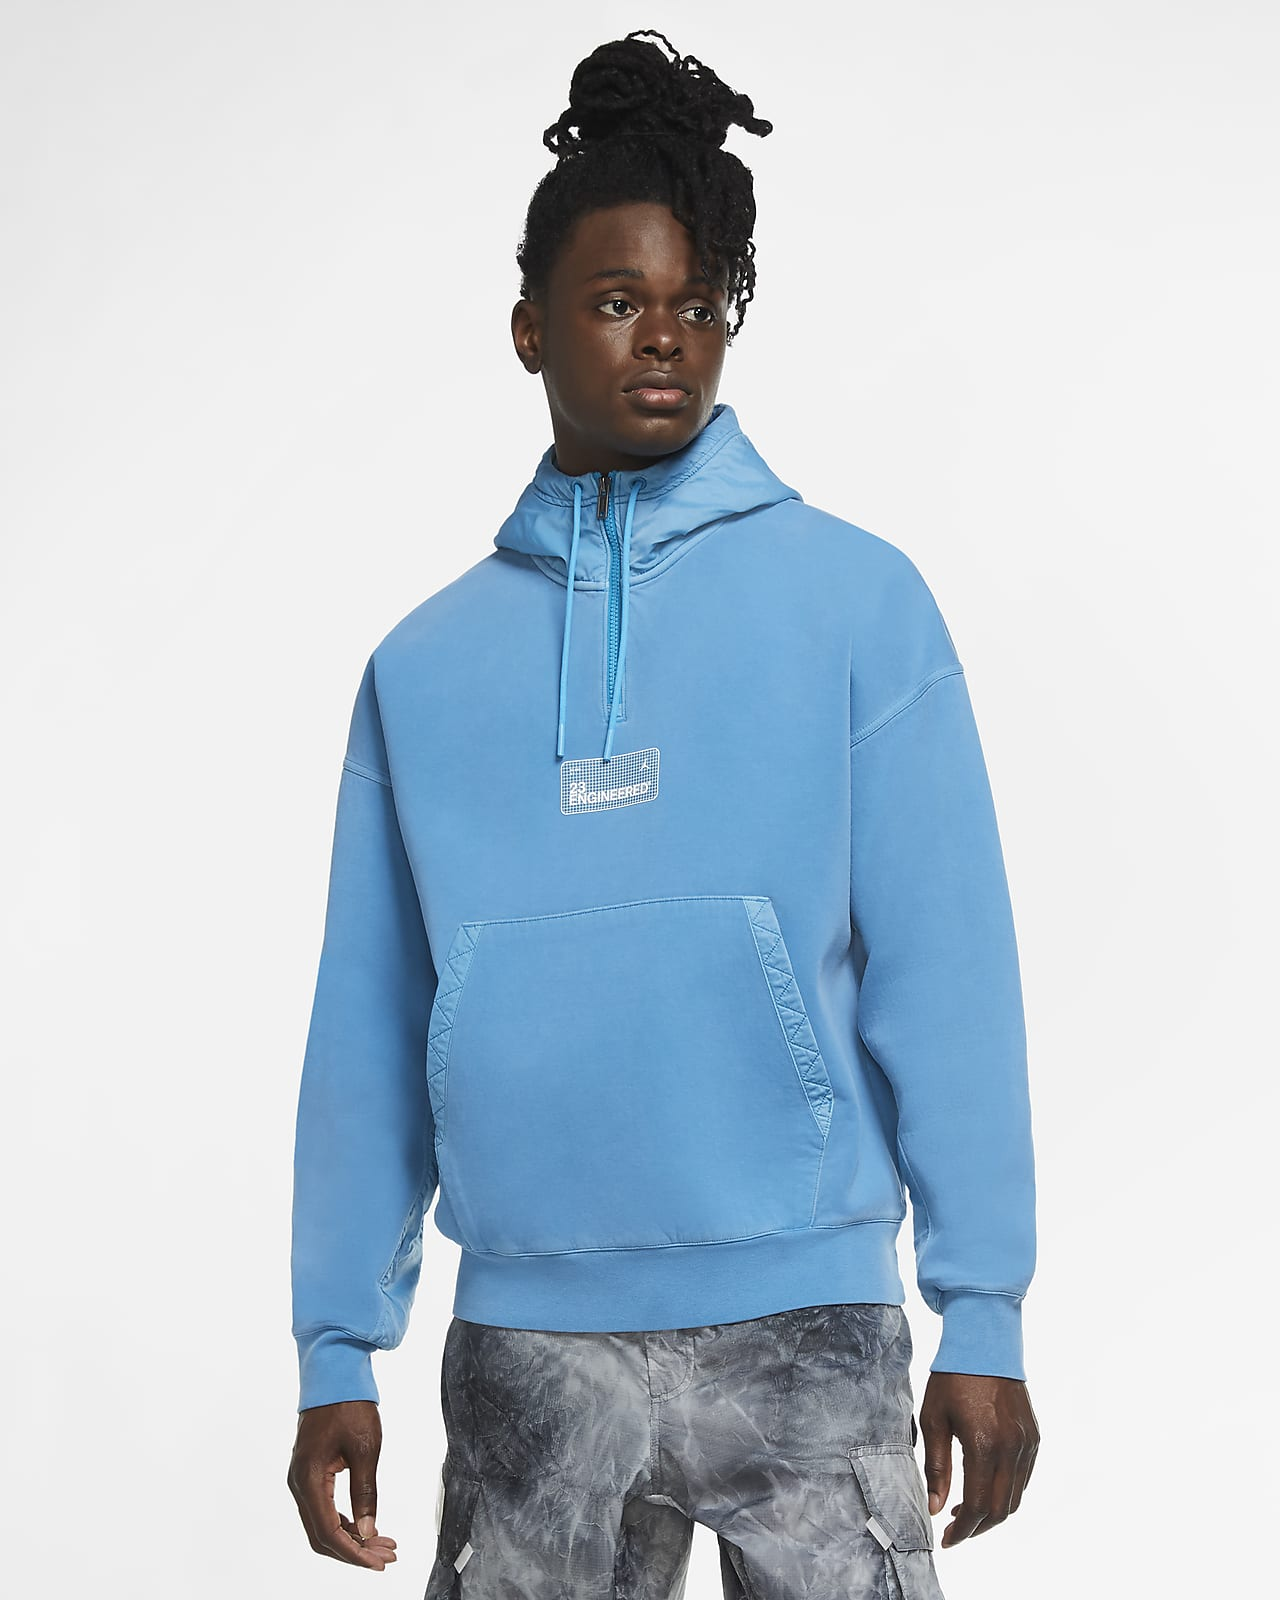 Sweat à capuche en tissu Fleece Jordan 23 Engineered pour Homme